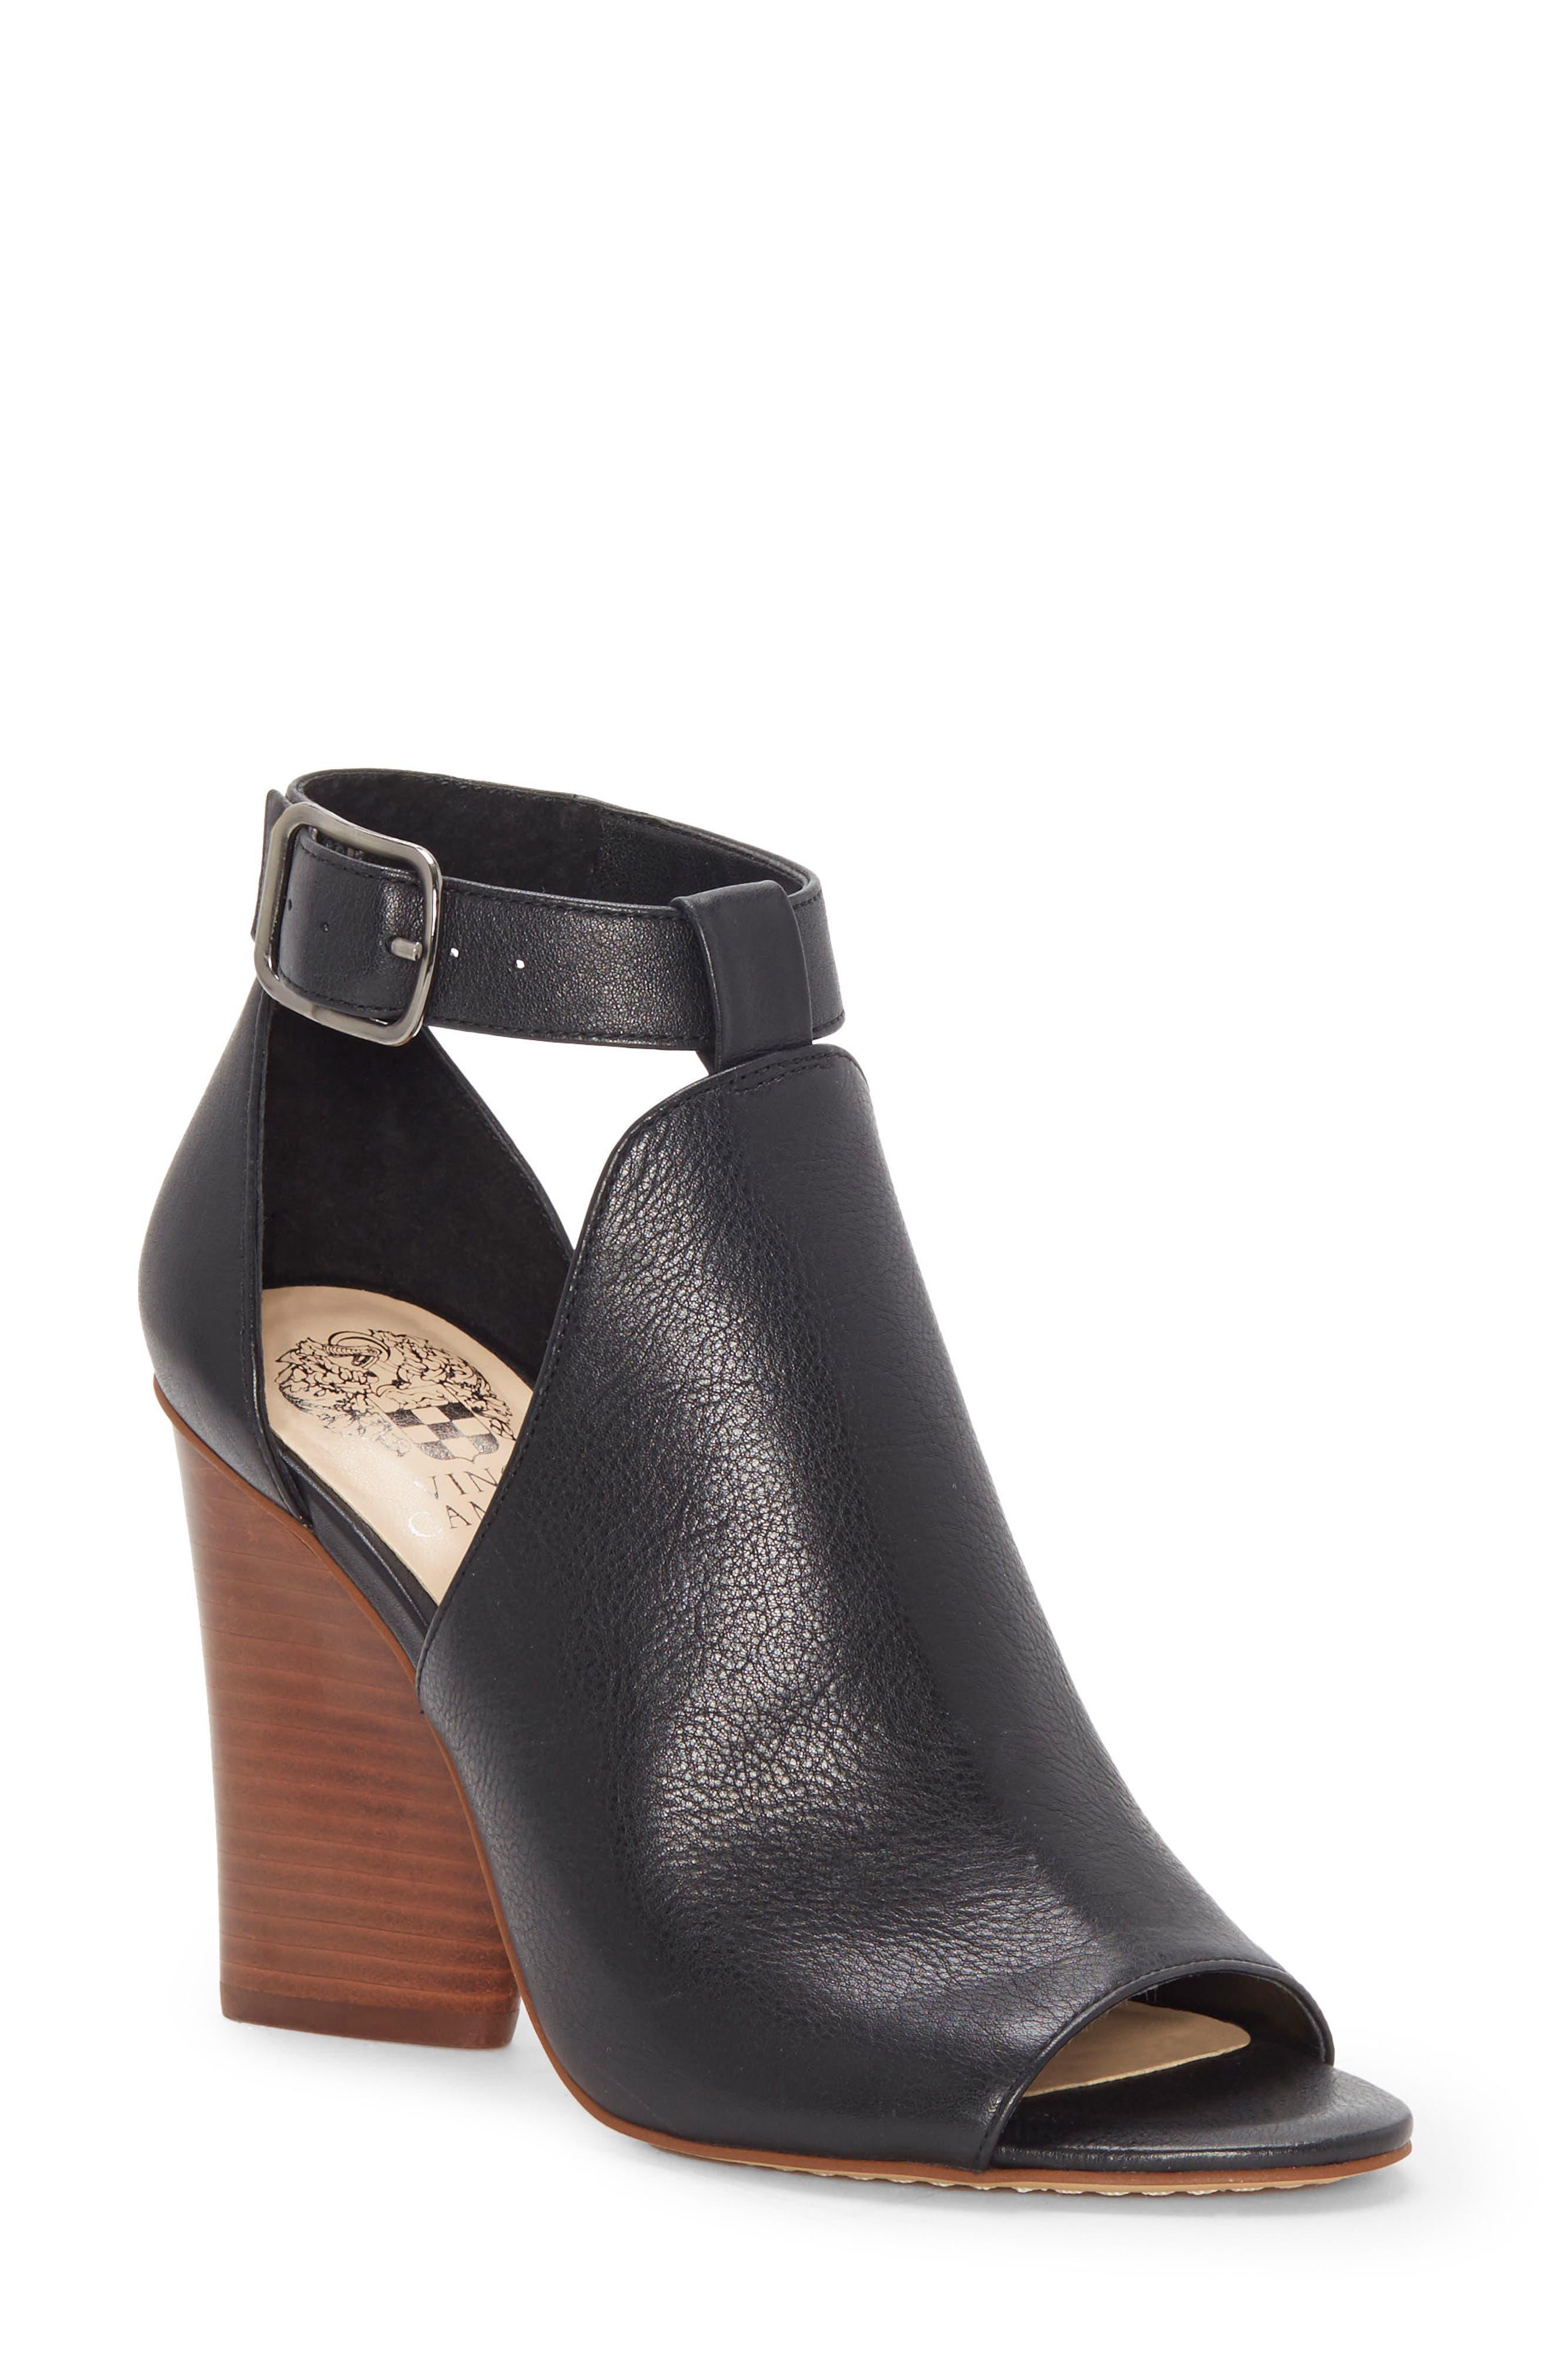 Adaren Peep Toe Sandal,                         Main,                         color, BLACK LEATHER